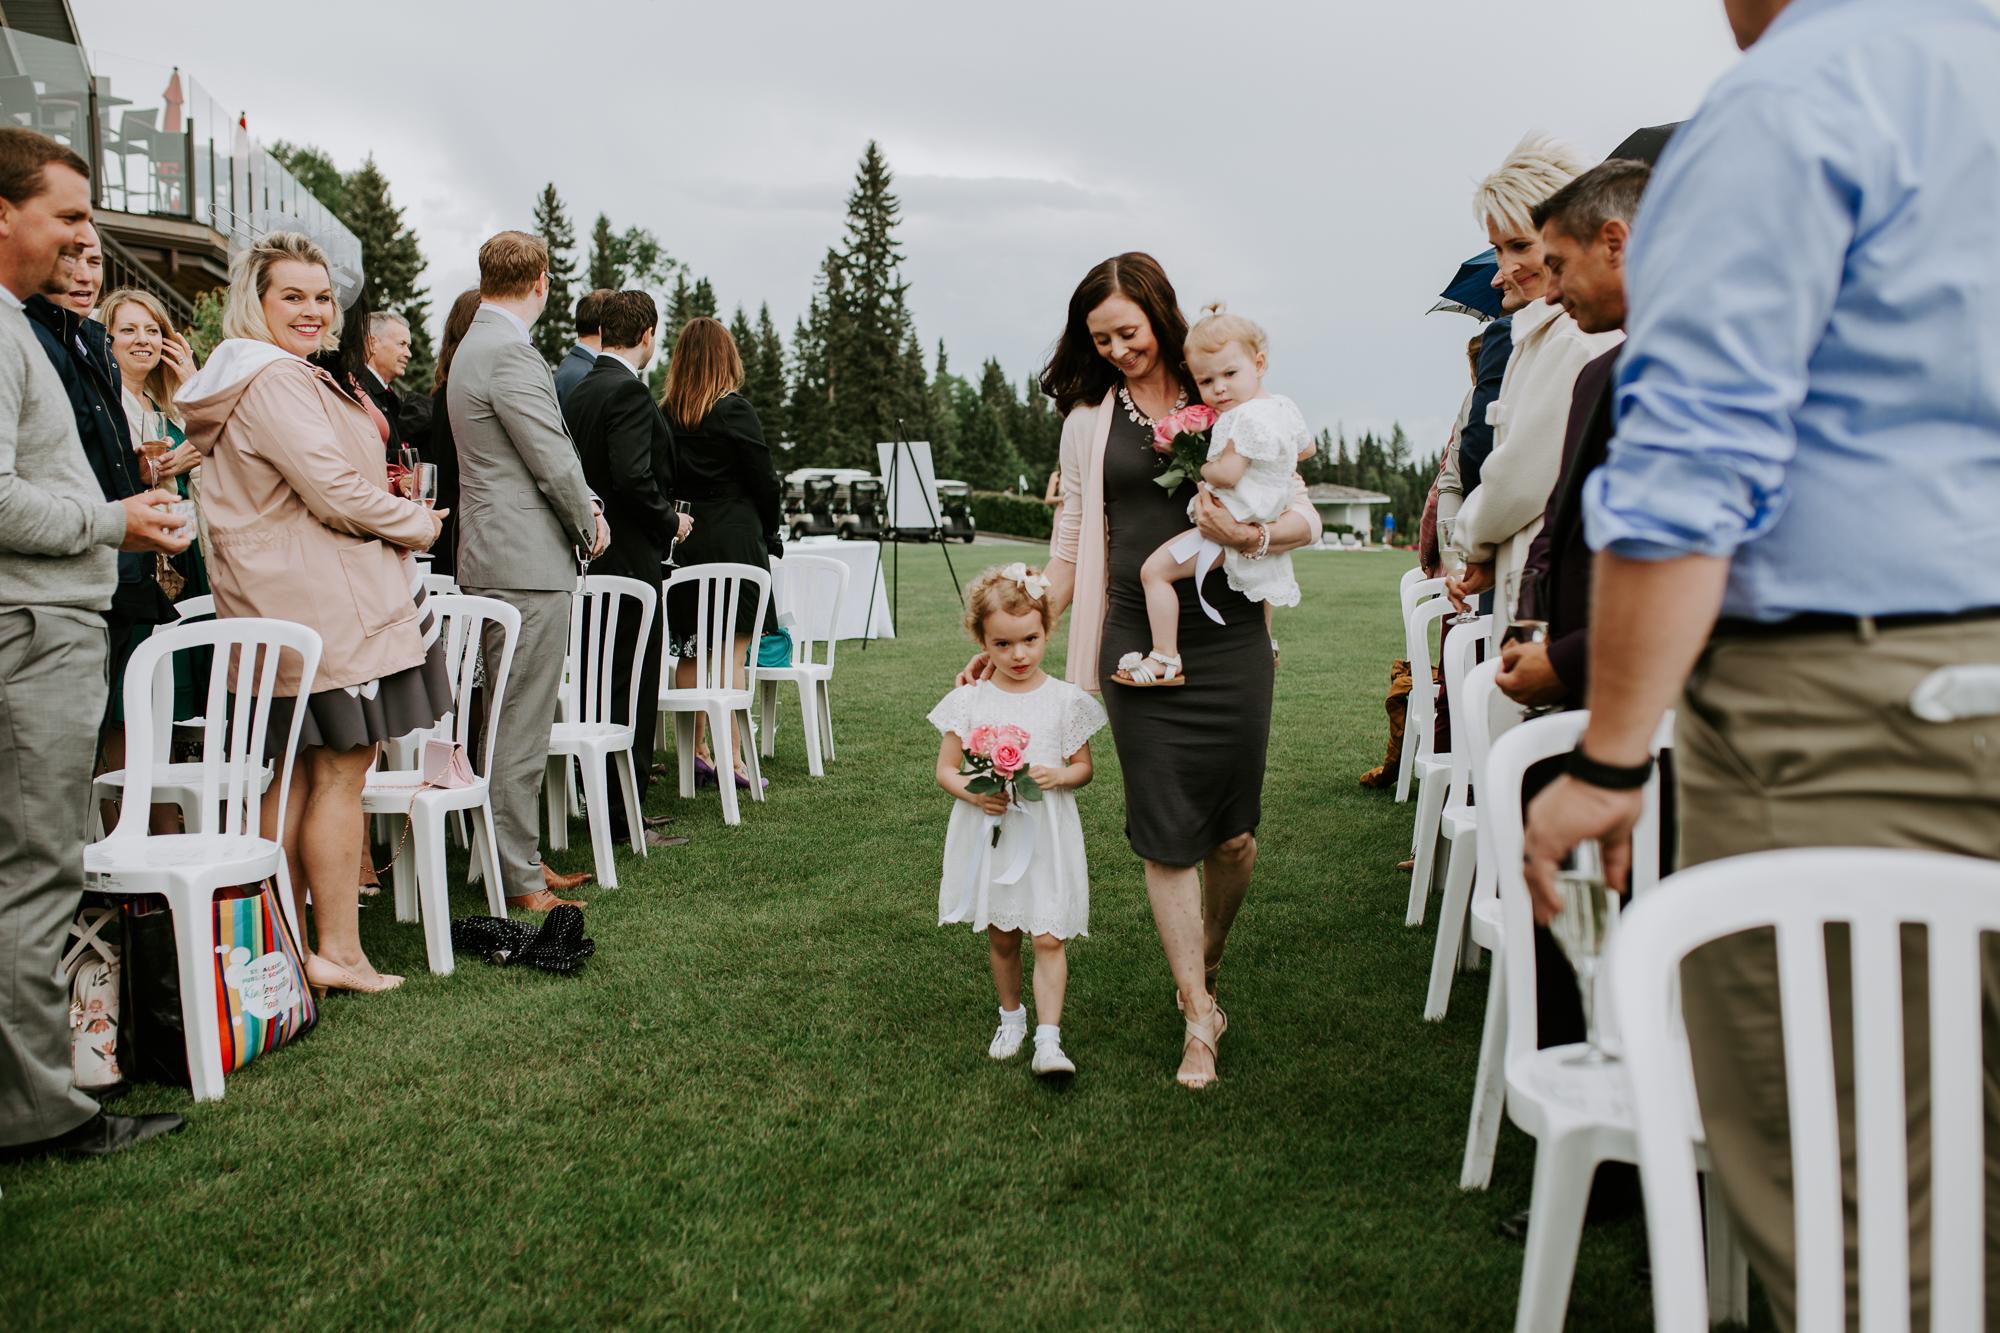 Priddis-Wedding-Photographer-JG-13.jpg